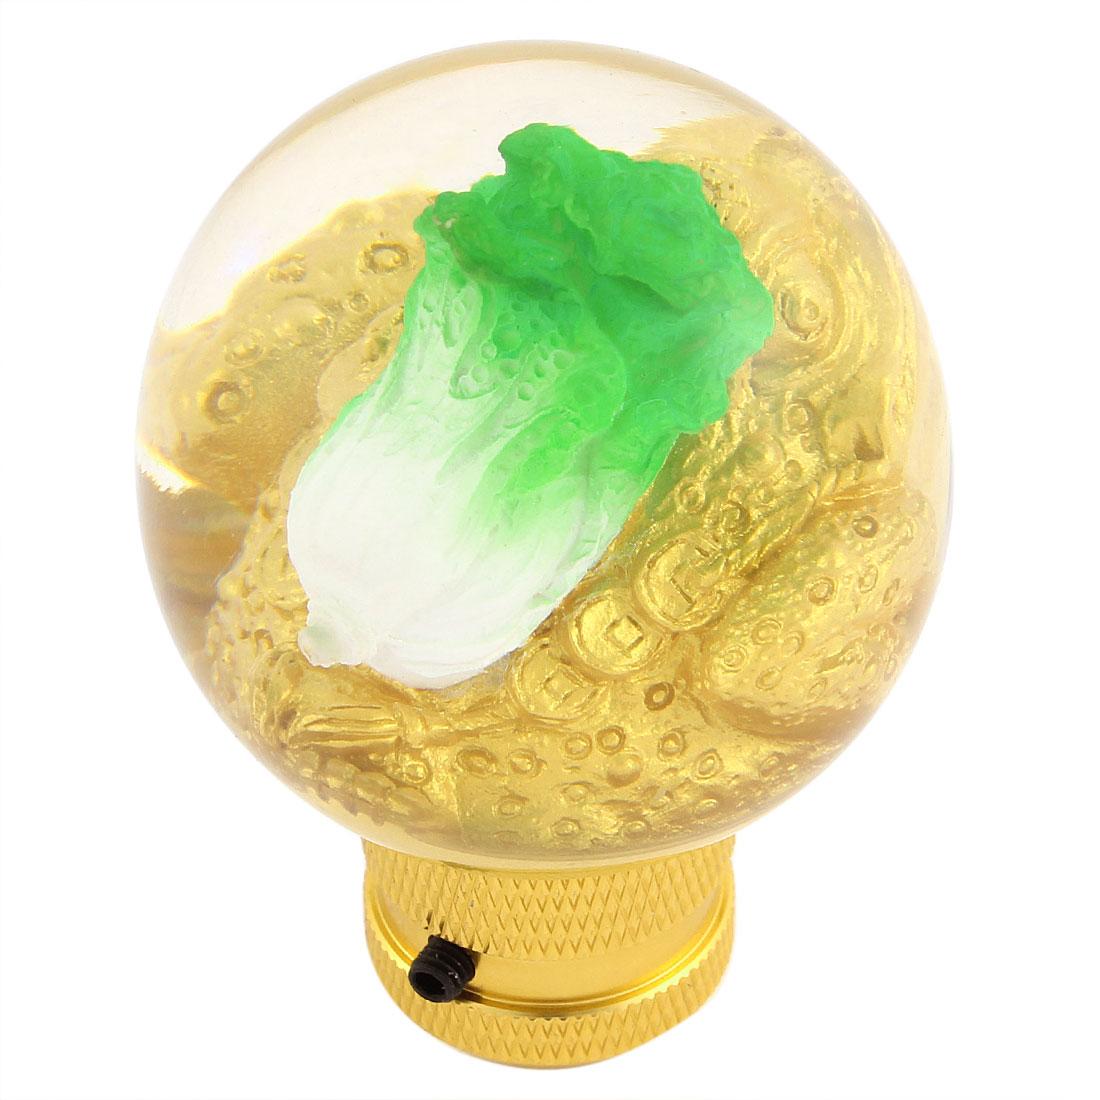 Cabbage Design Auto Car Gear Stick Shift Knob Shifter Protector Gold Tone Green